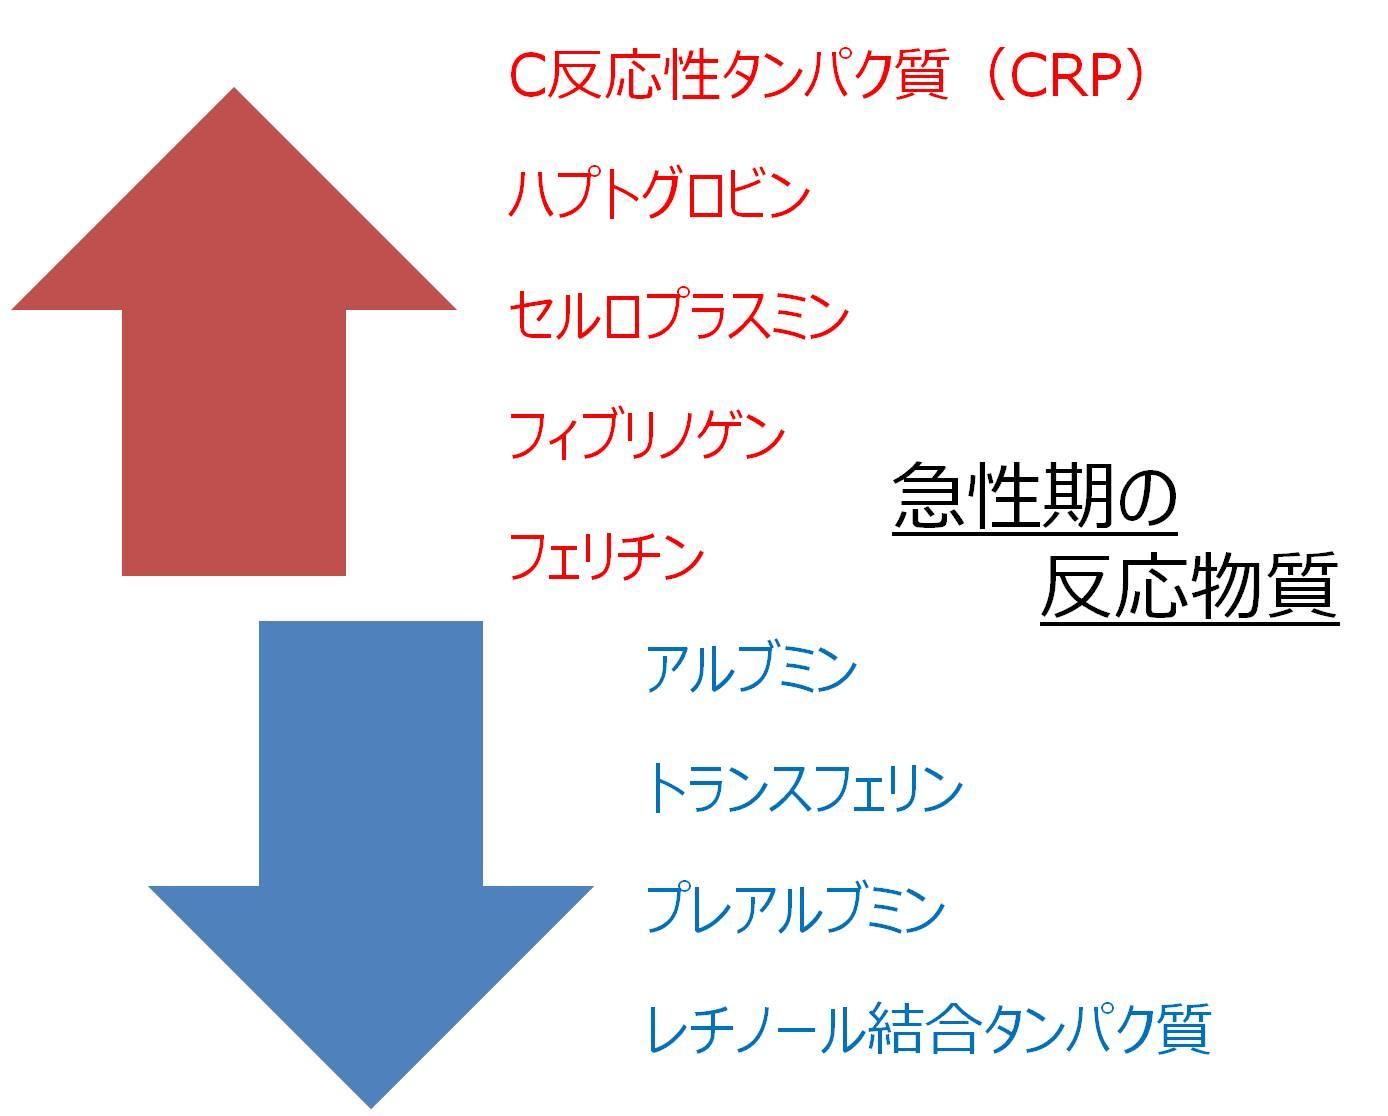 CRP 急性炎症 血液検査